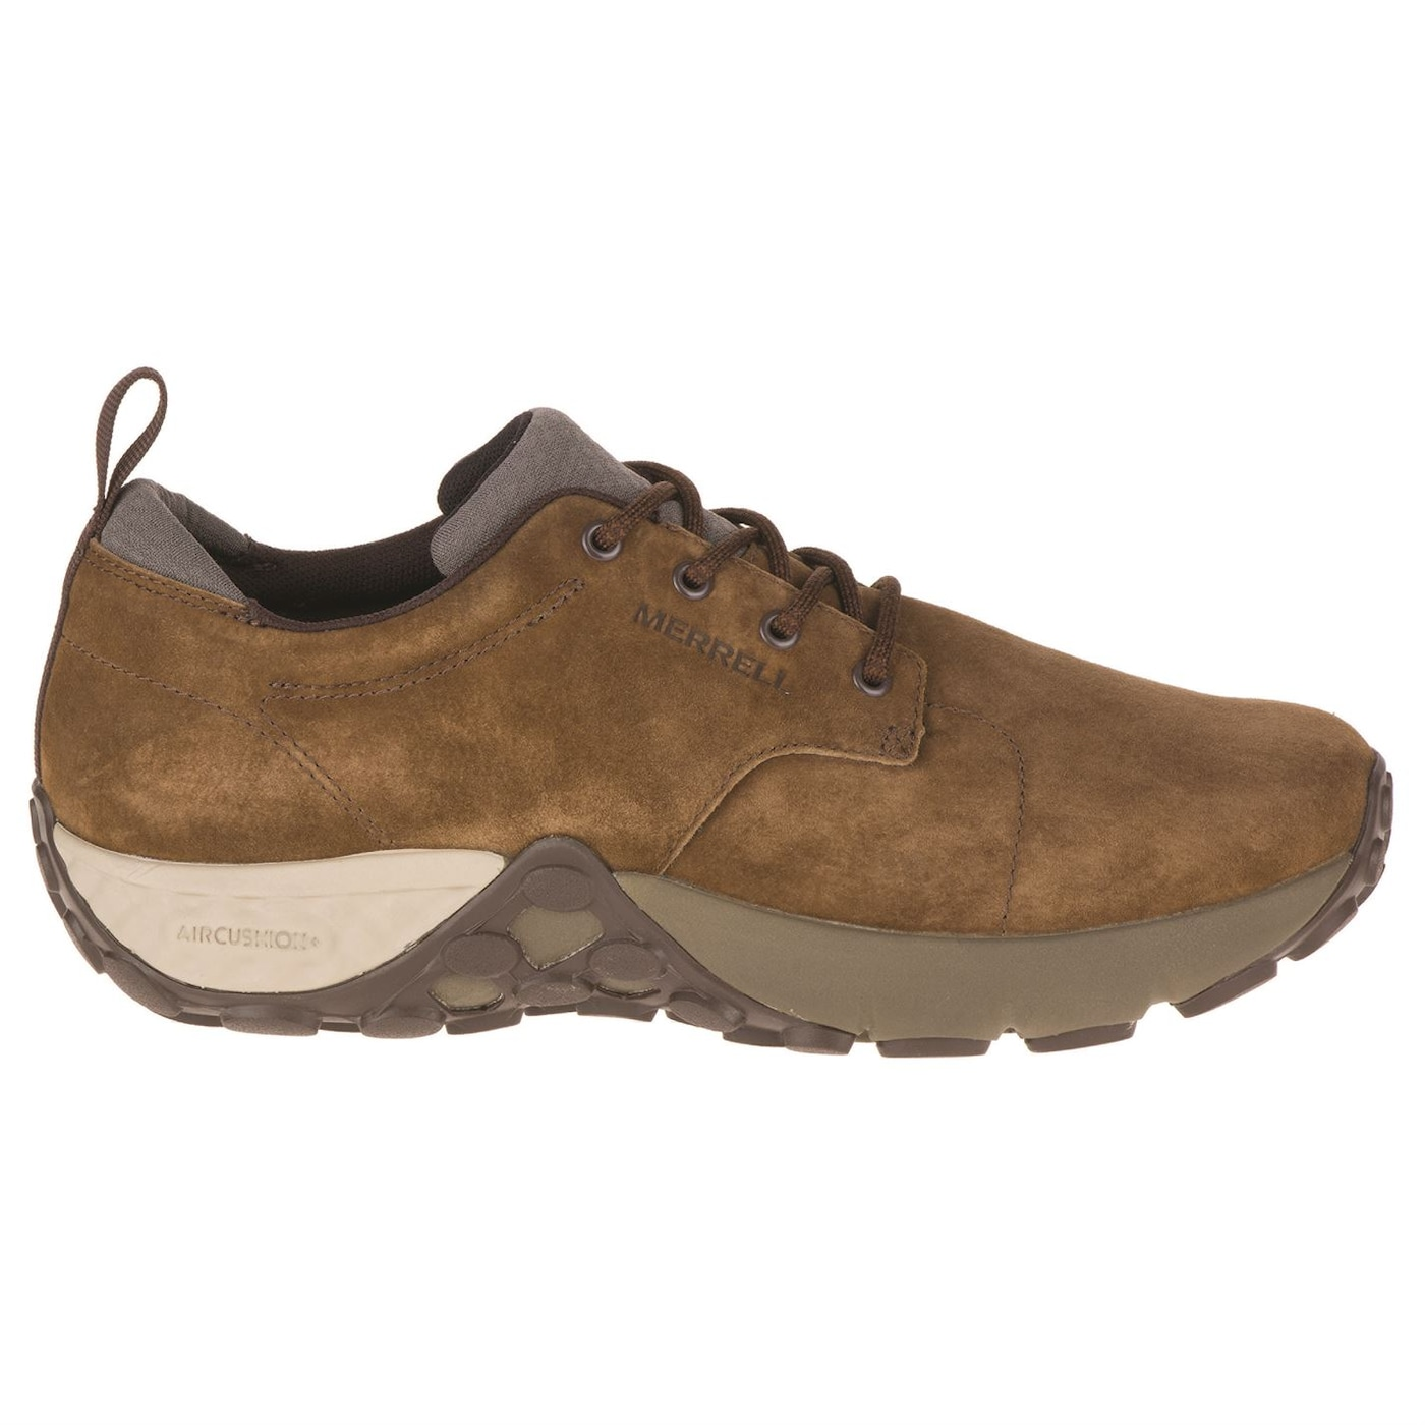 Merrell Jungle Lace Mens Walking Shoes